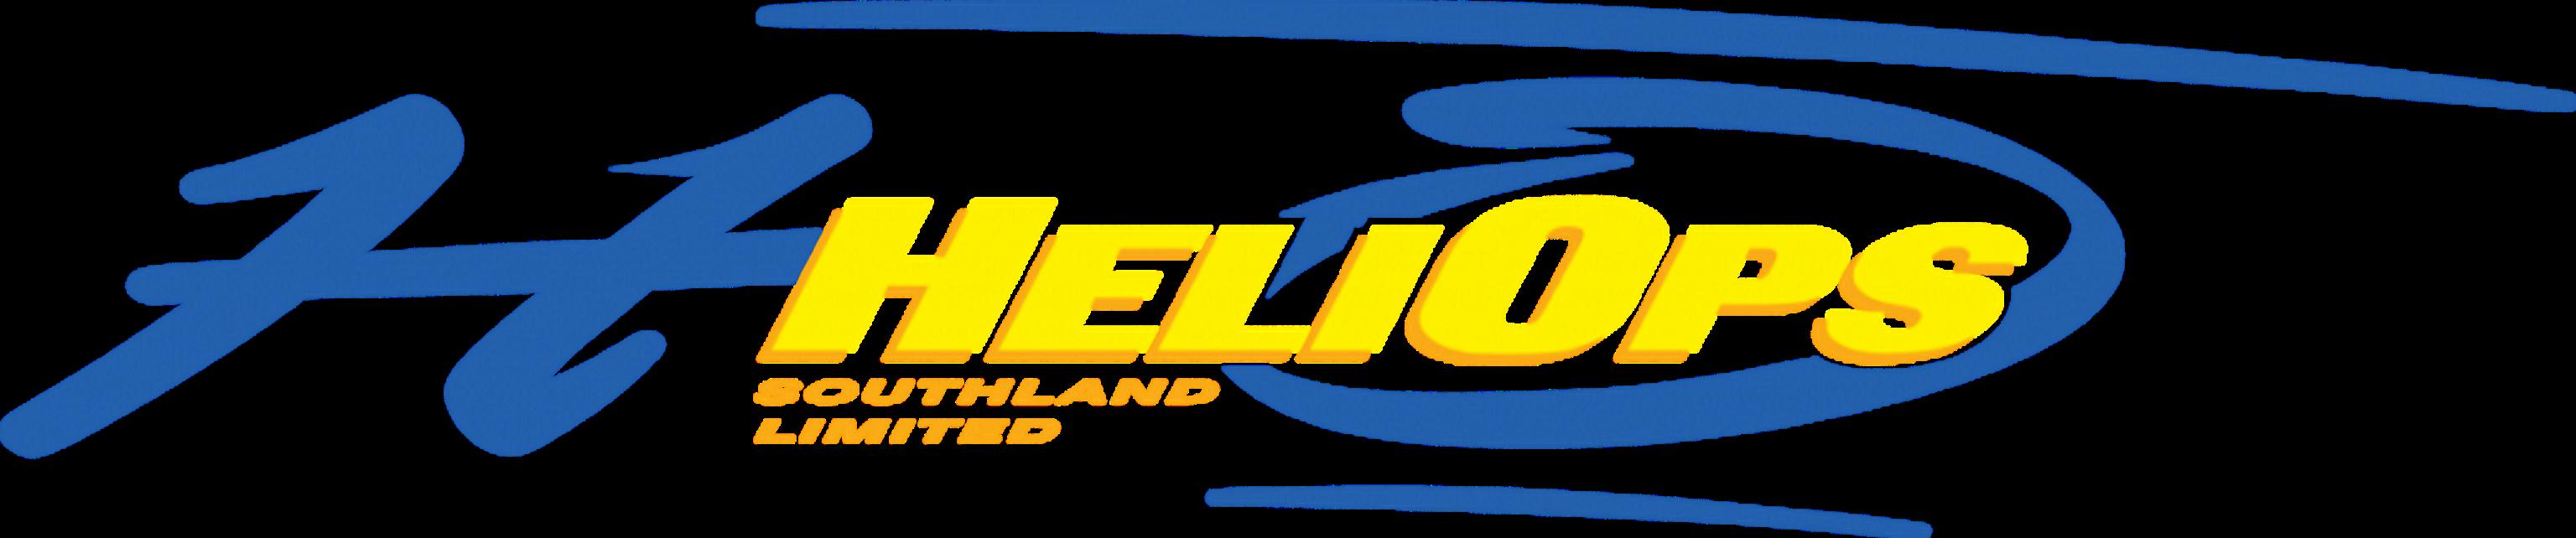 HeliOps Southland Ltd